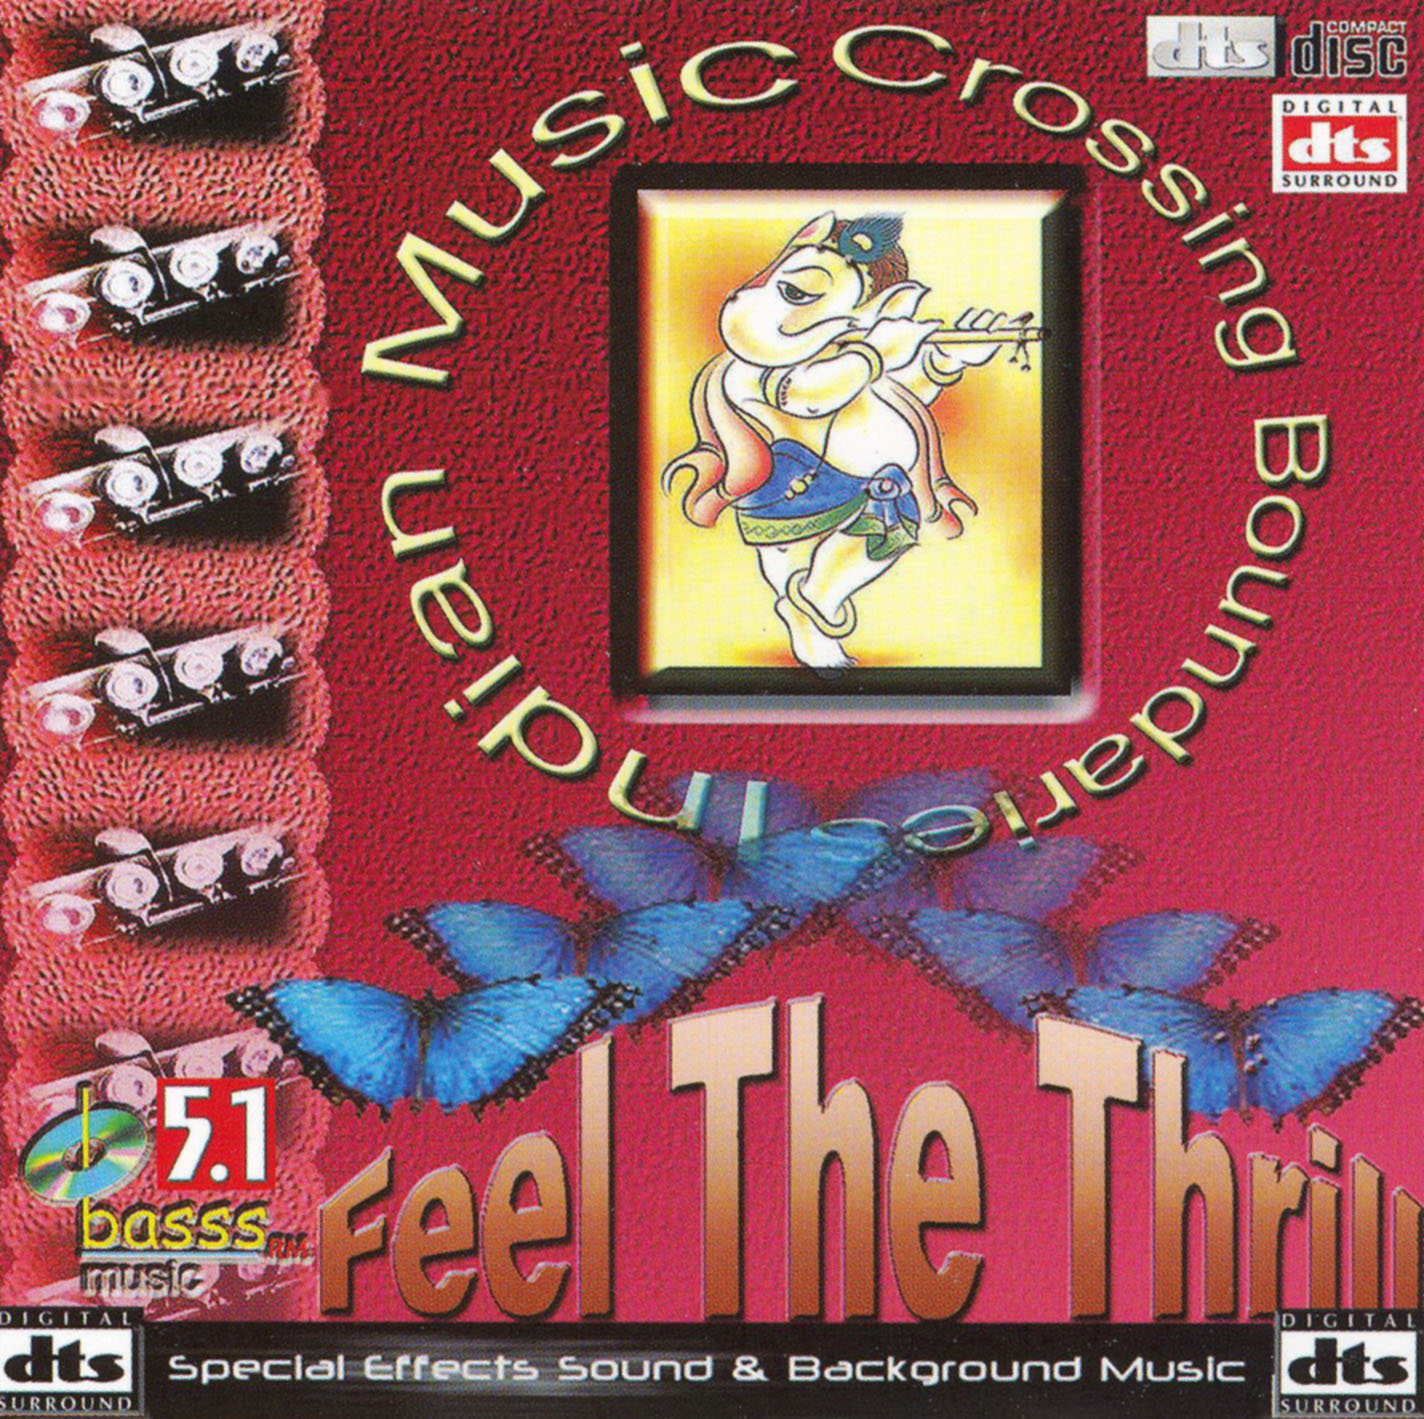 Sipra Bose: Digital Viz-A-Viz Classical - Feel the Thrill